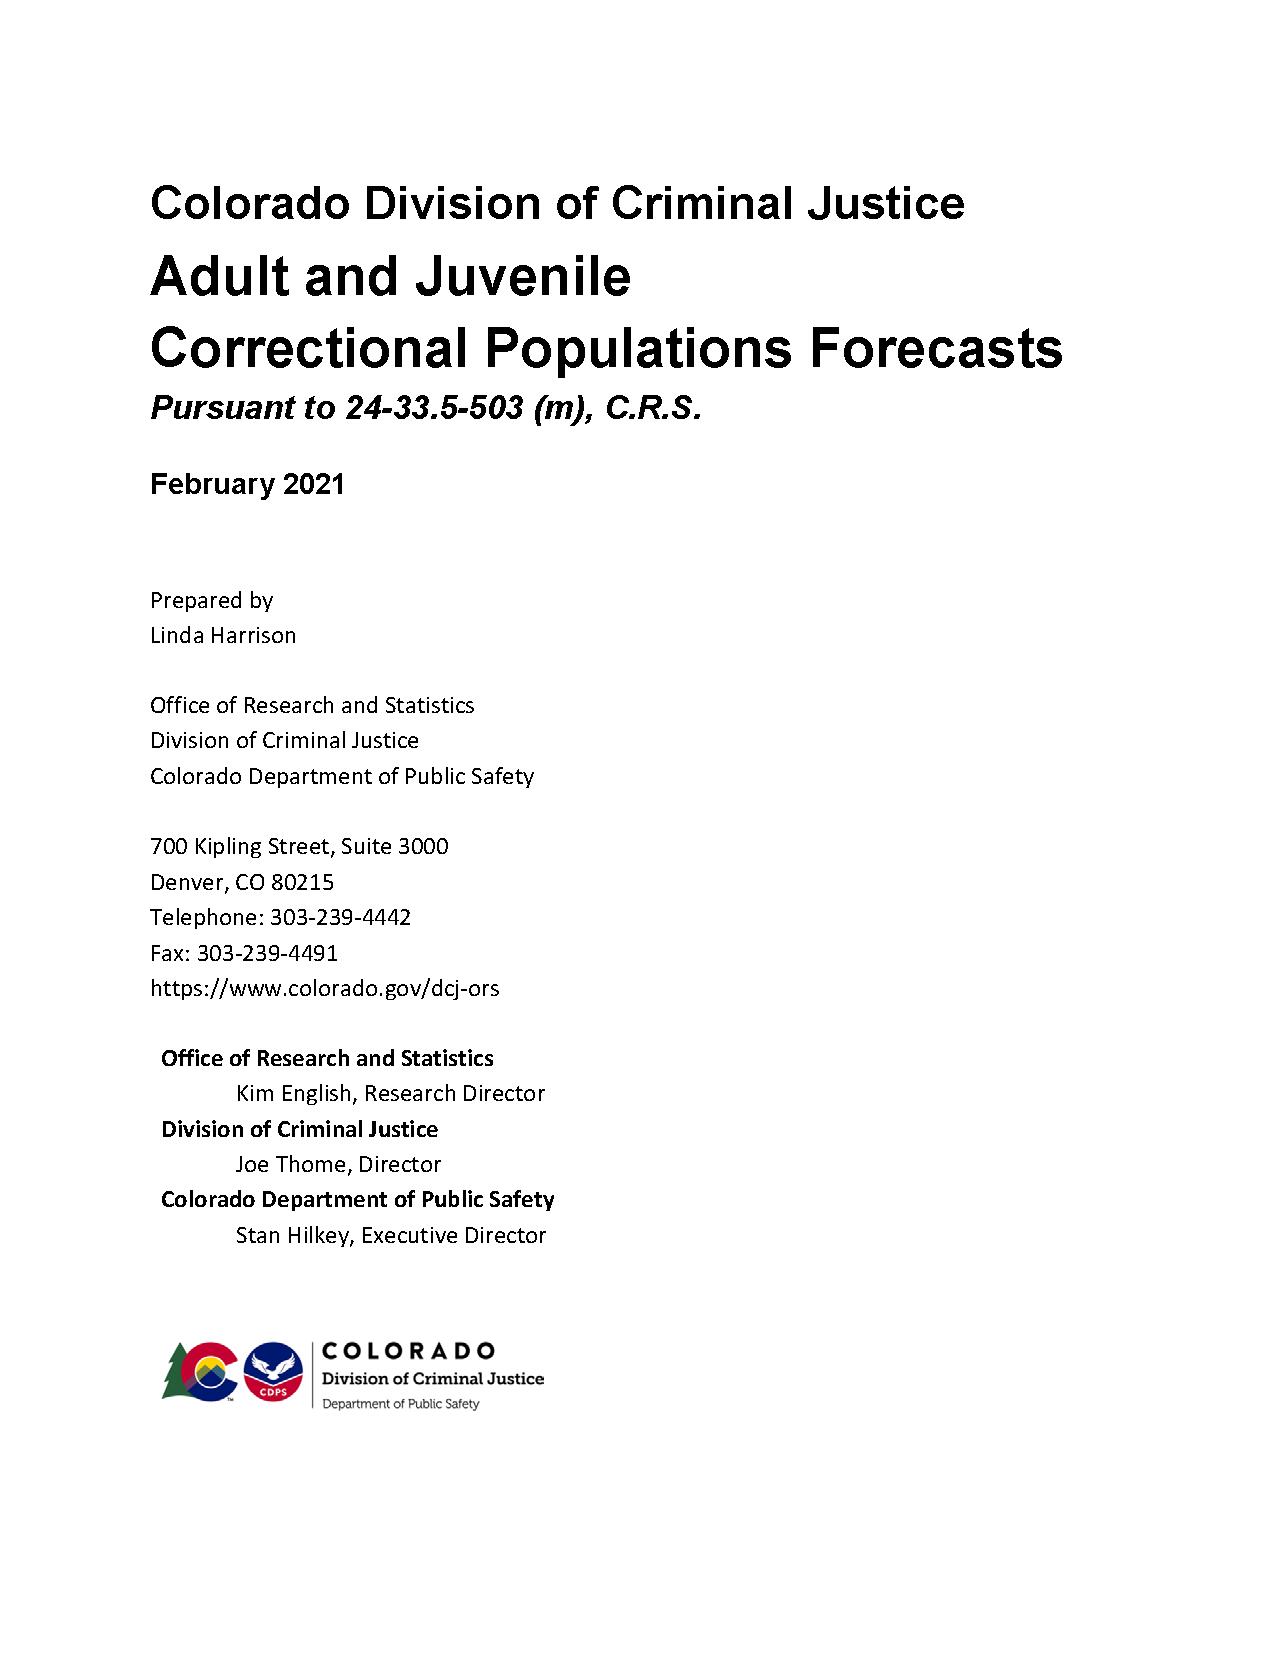 Correctional Population Forecasts, FY 2021